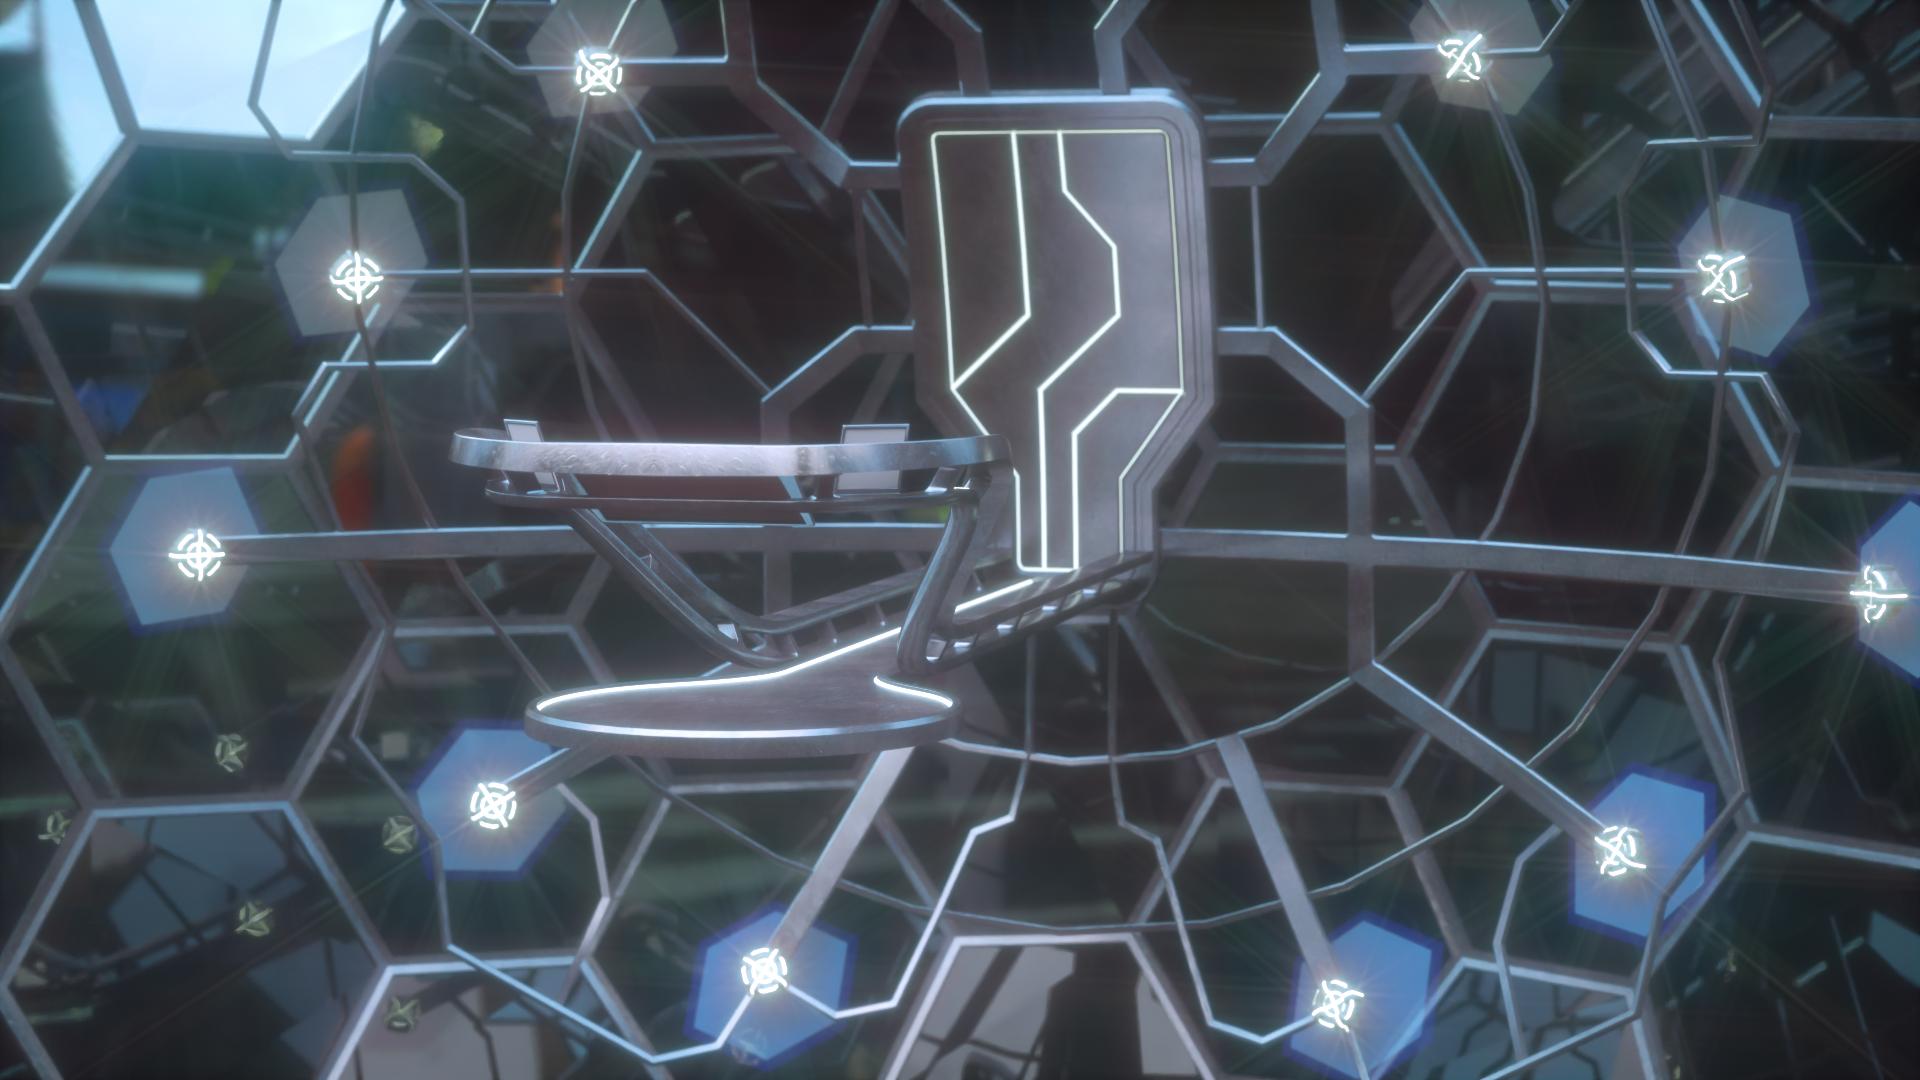 Camera animation for the platform model